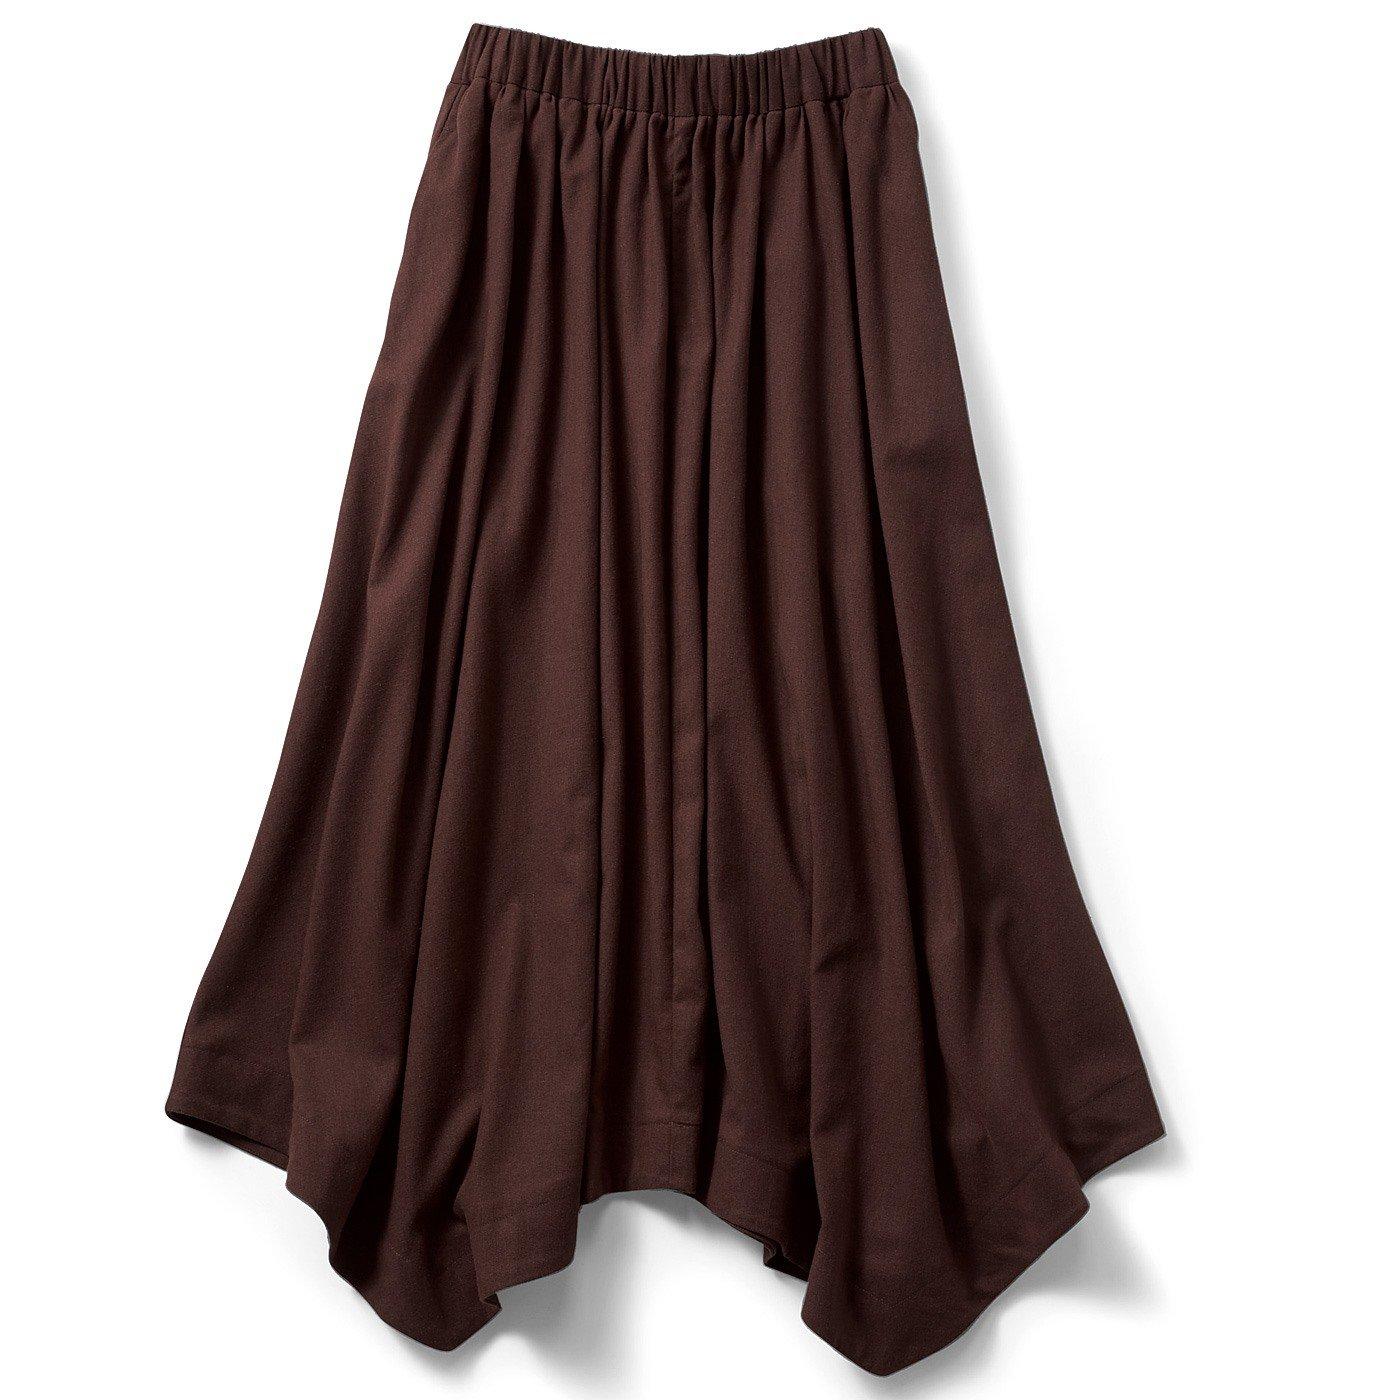 IEDIT[イディット] リネン混のイレギュラーヘムロングスカート〈ブラウン〉